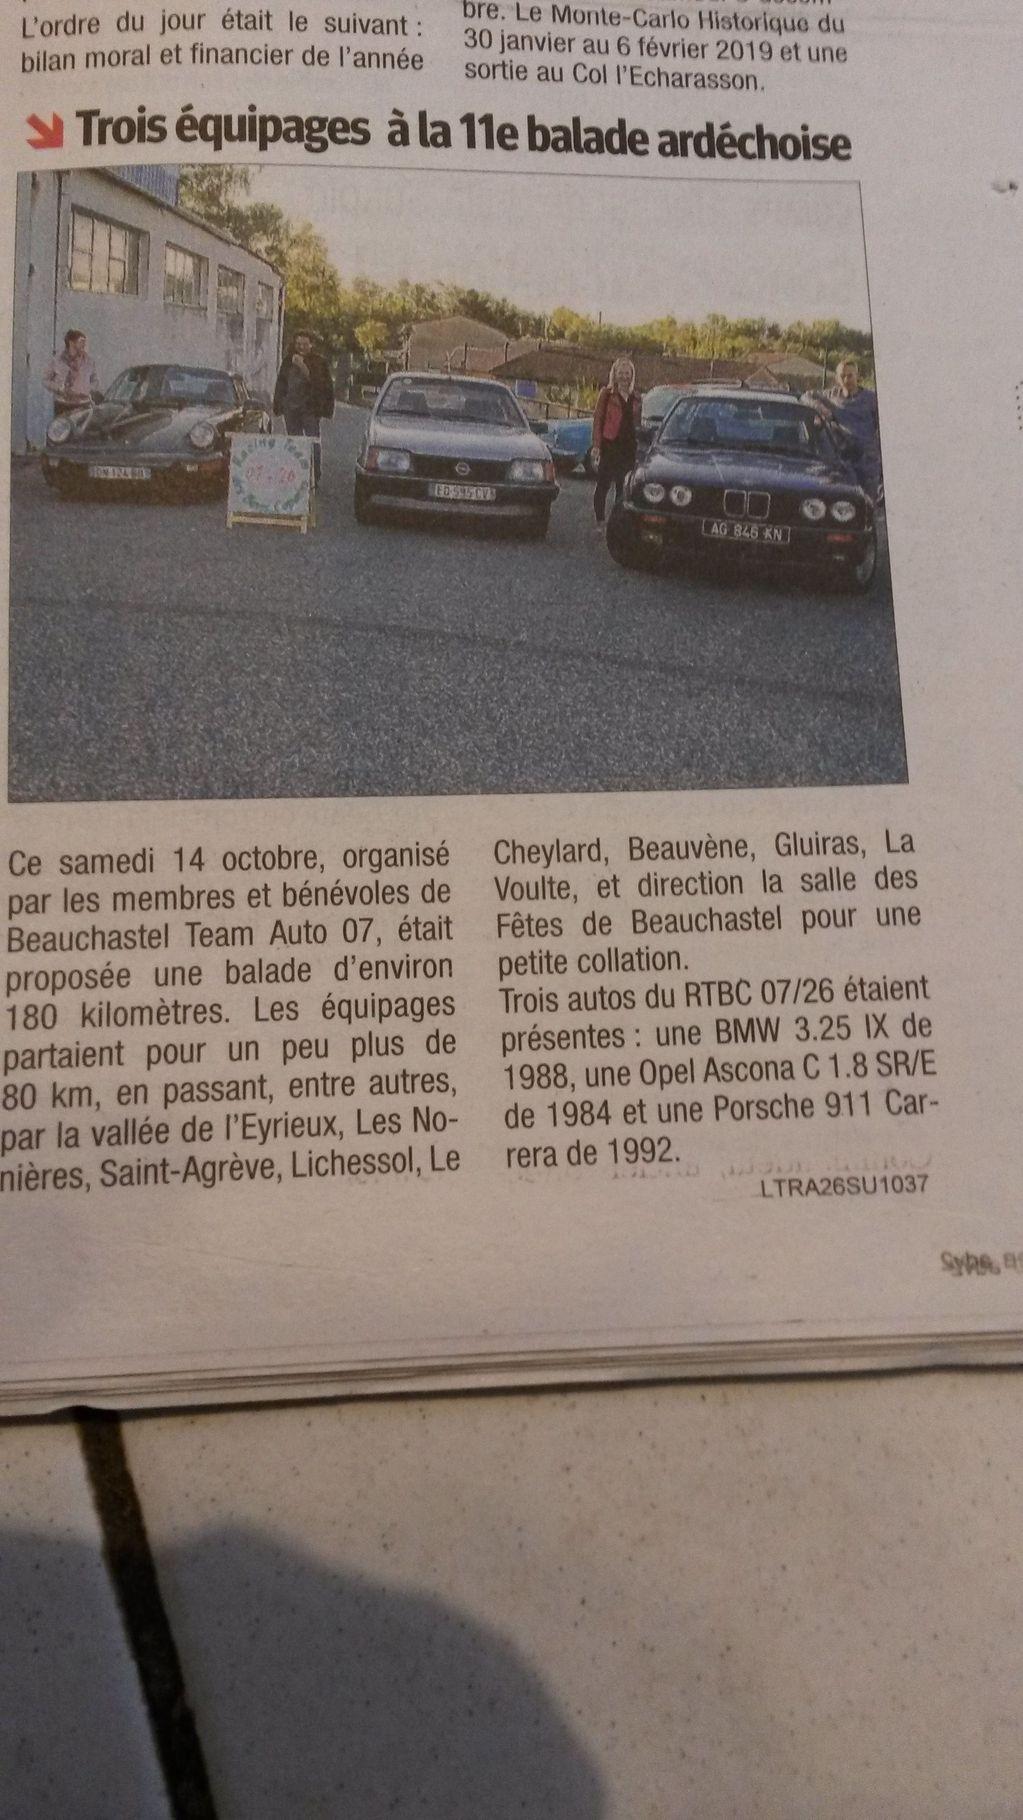 [07] 13/10/2018 - 11ème balade Ardèchoise - Beauchastel - Page 2 18101810040623632315949219